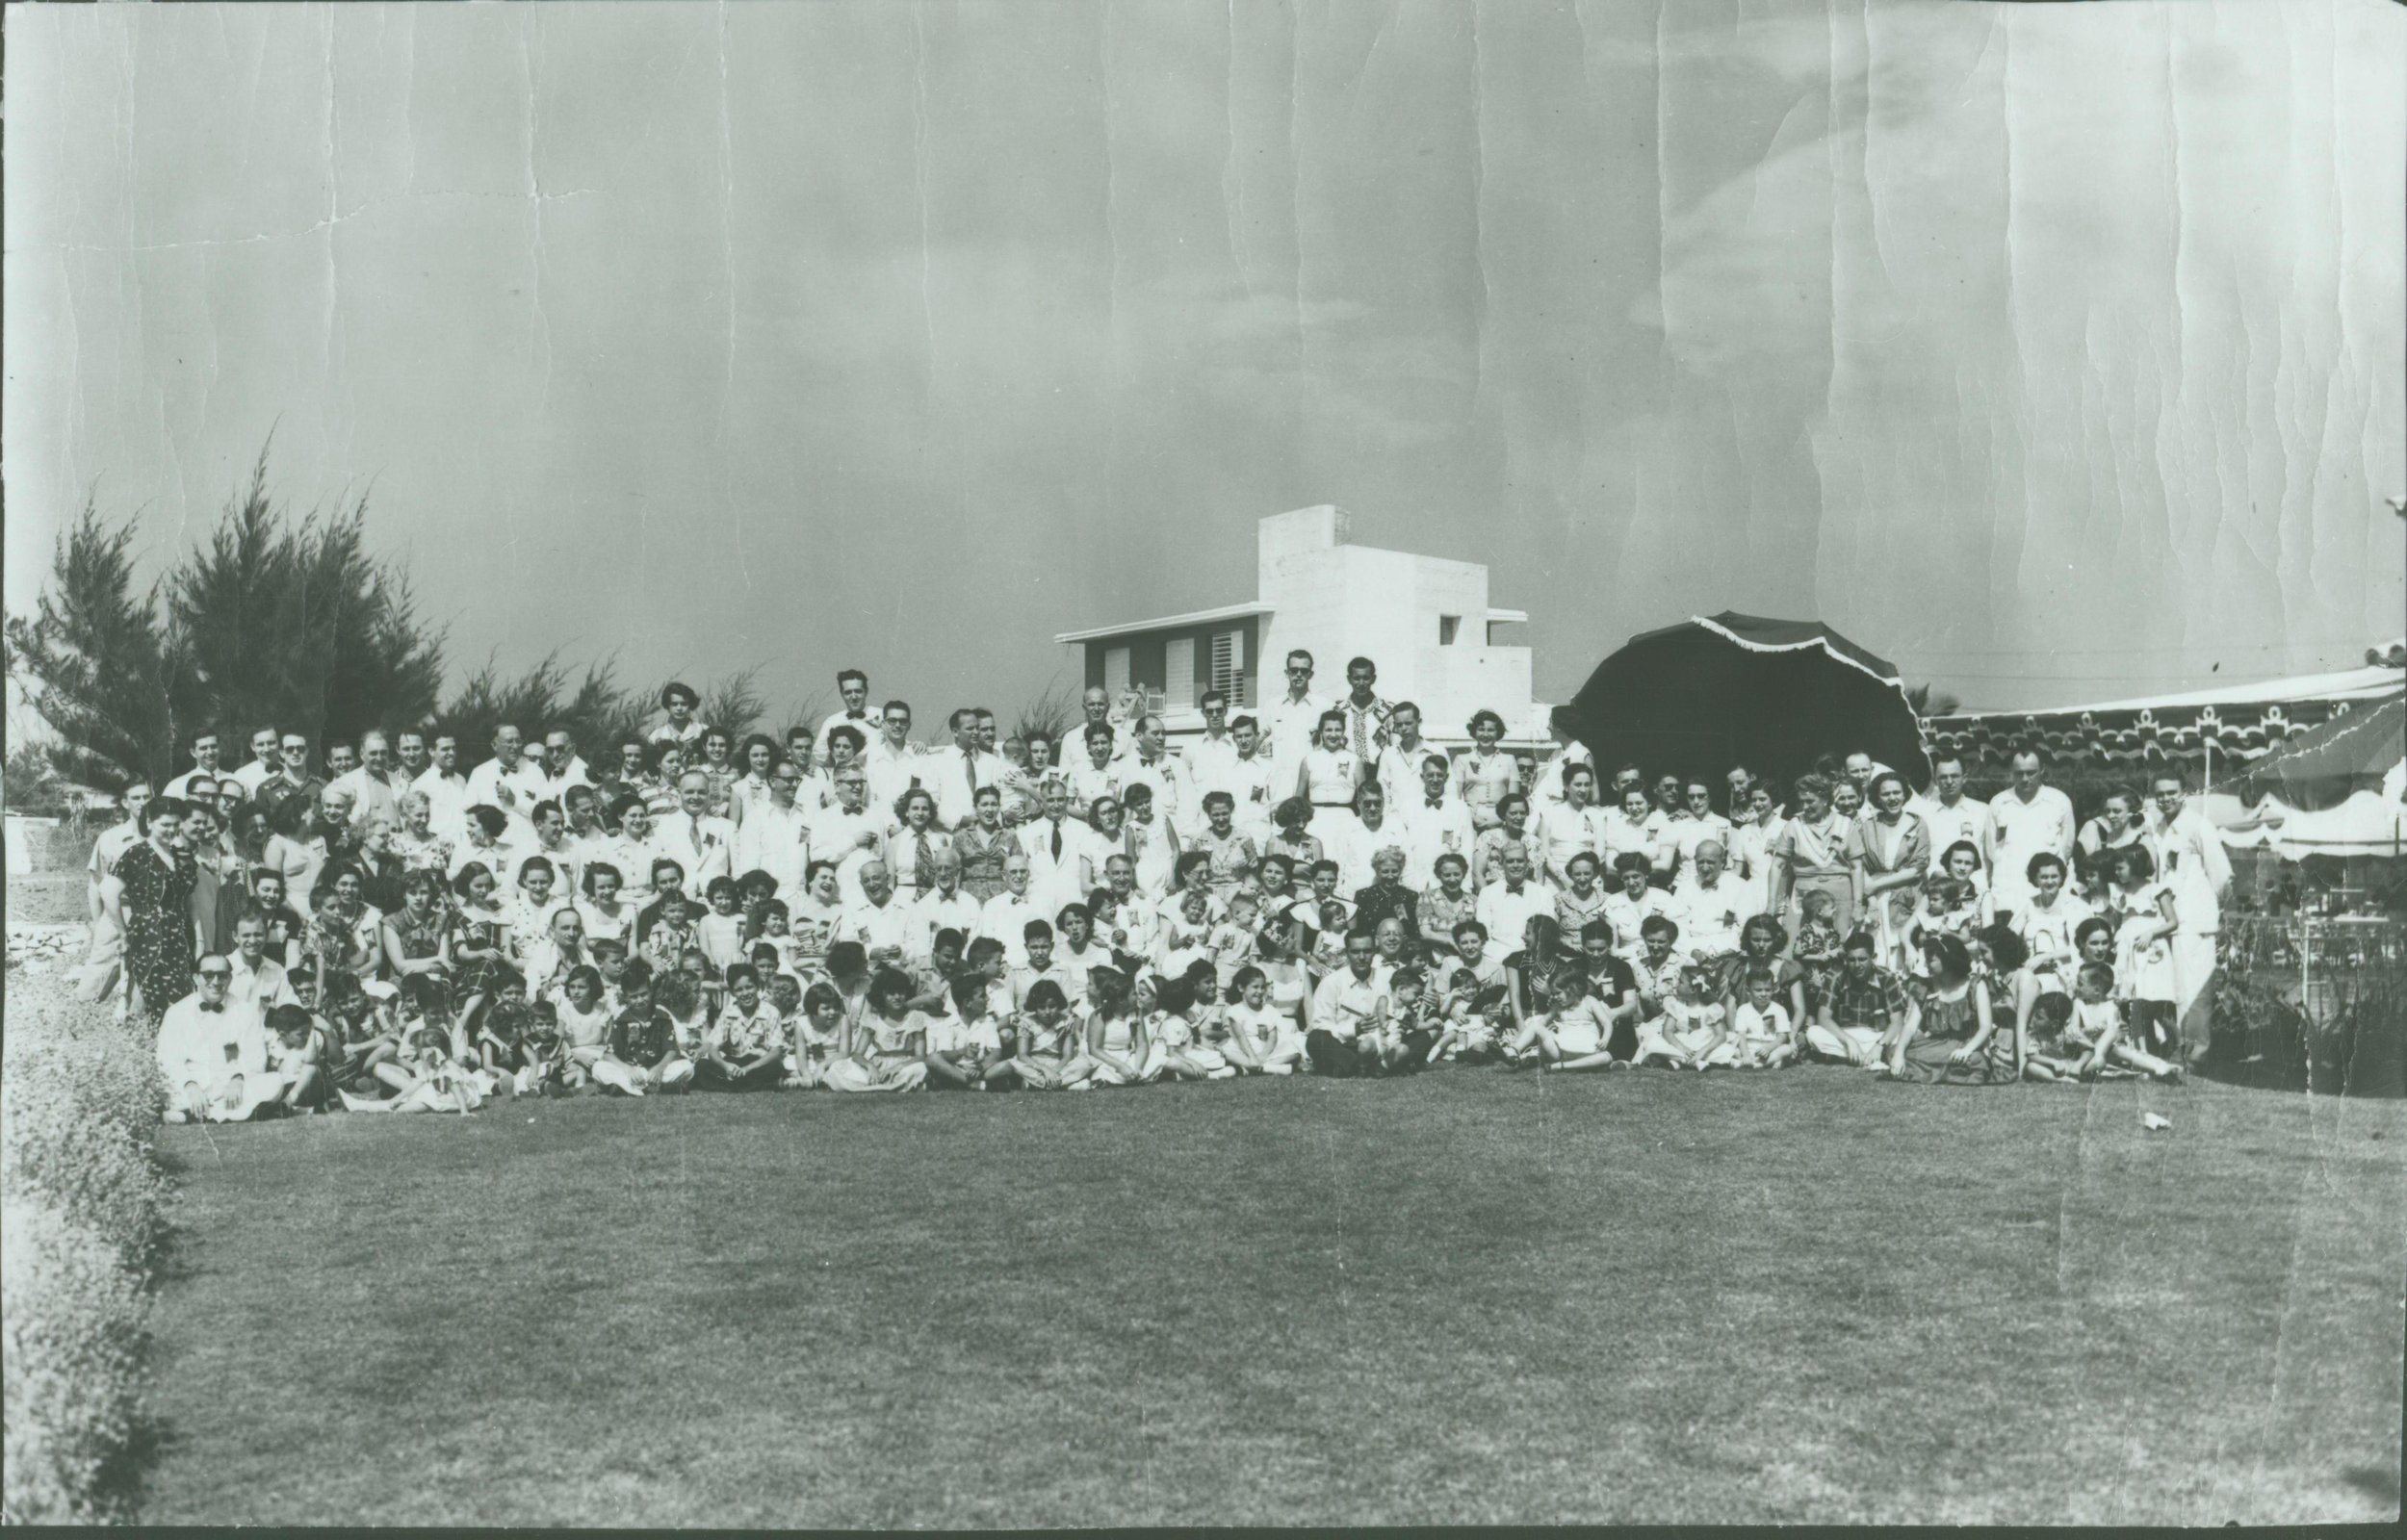 1951 Reunion